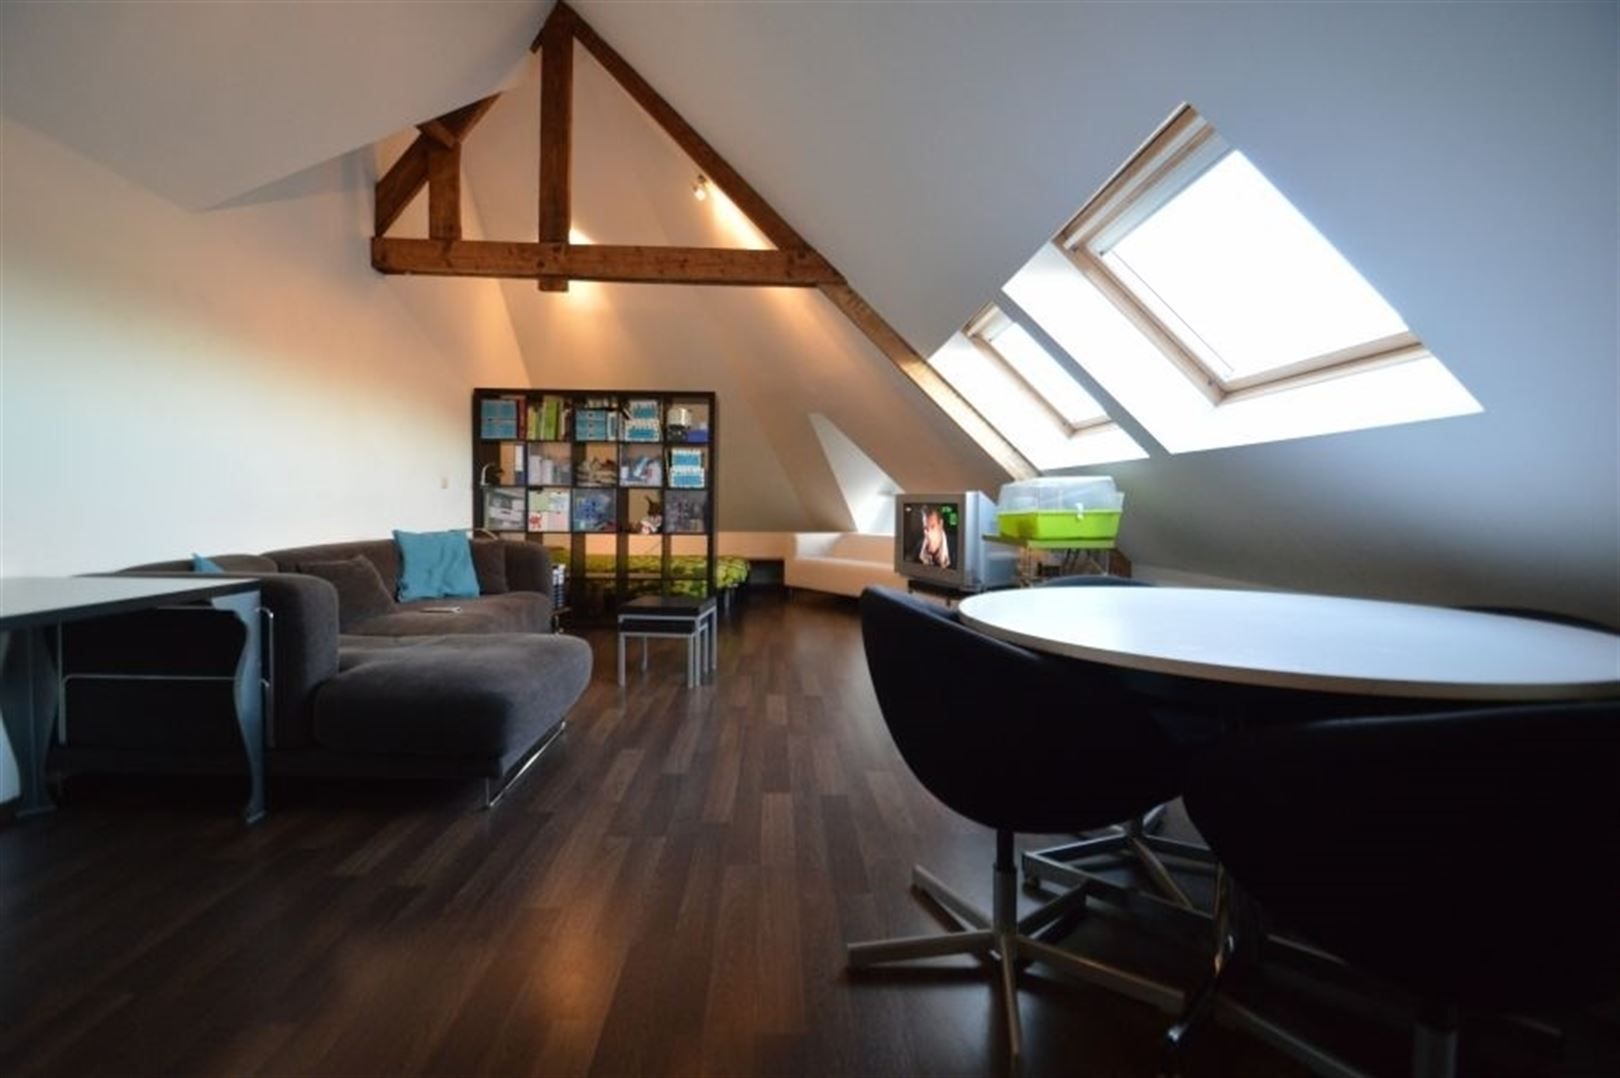 Foto 2 : Appartement te 9200 Dendermonde (België) - Prijs € 470